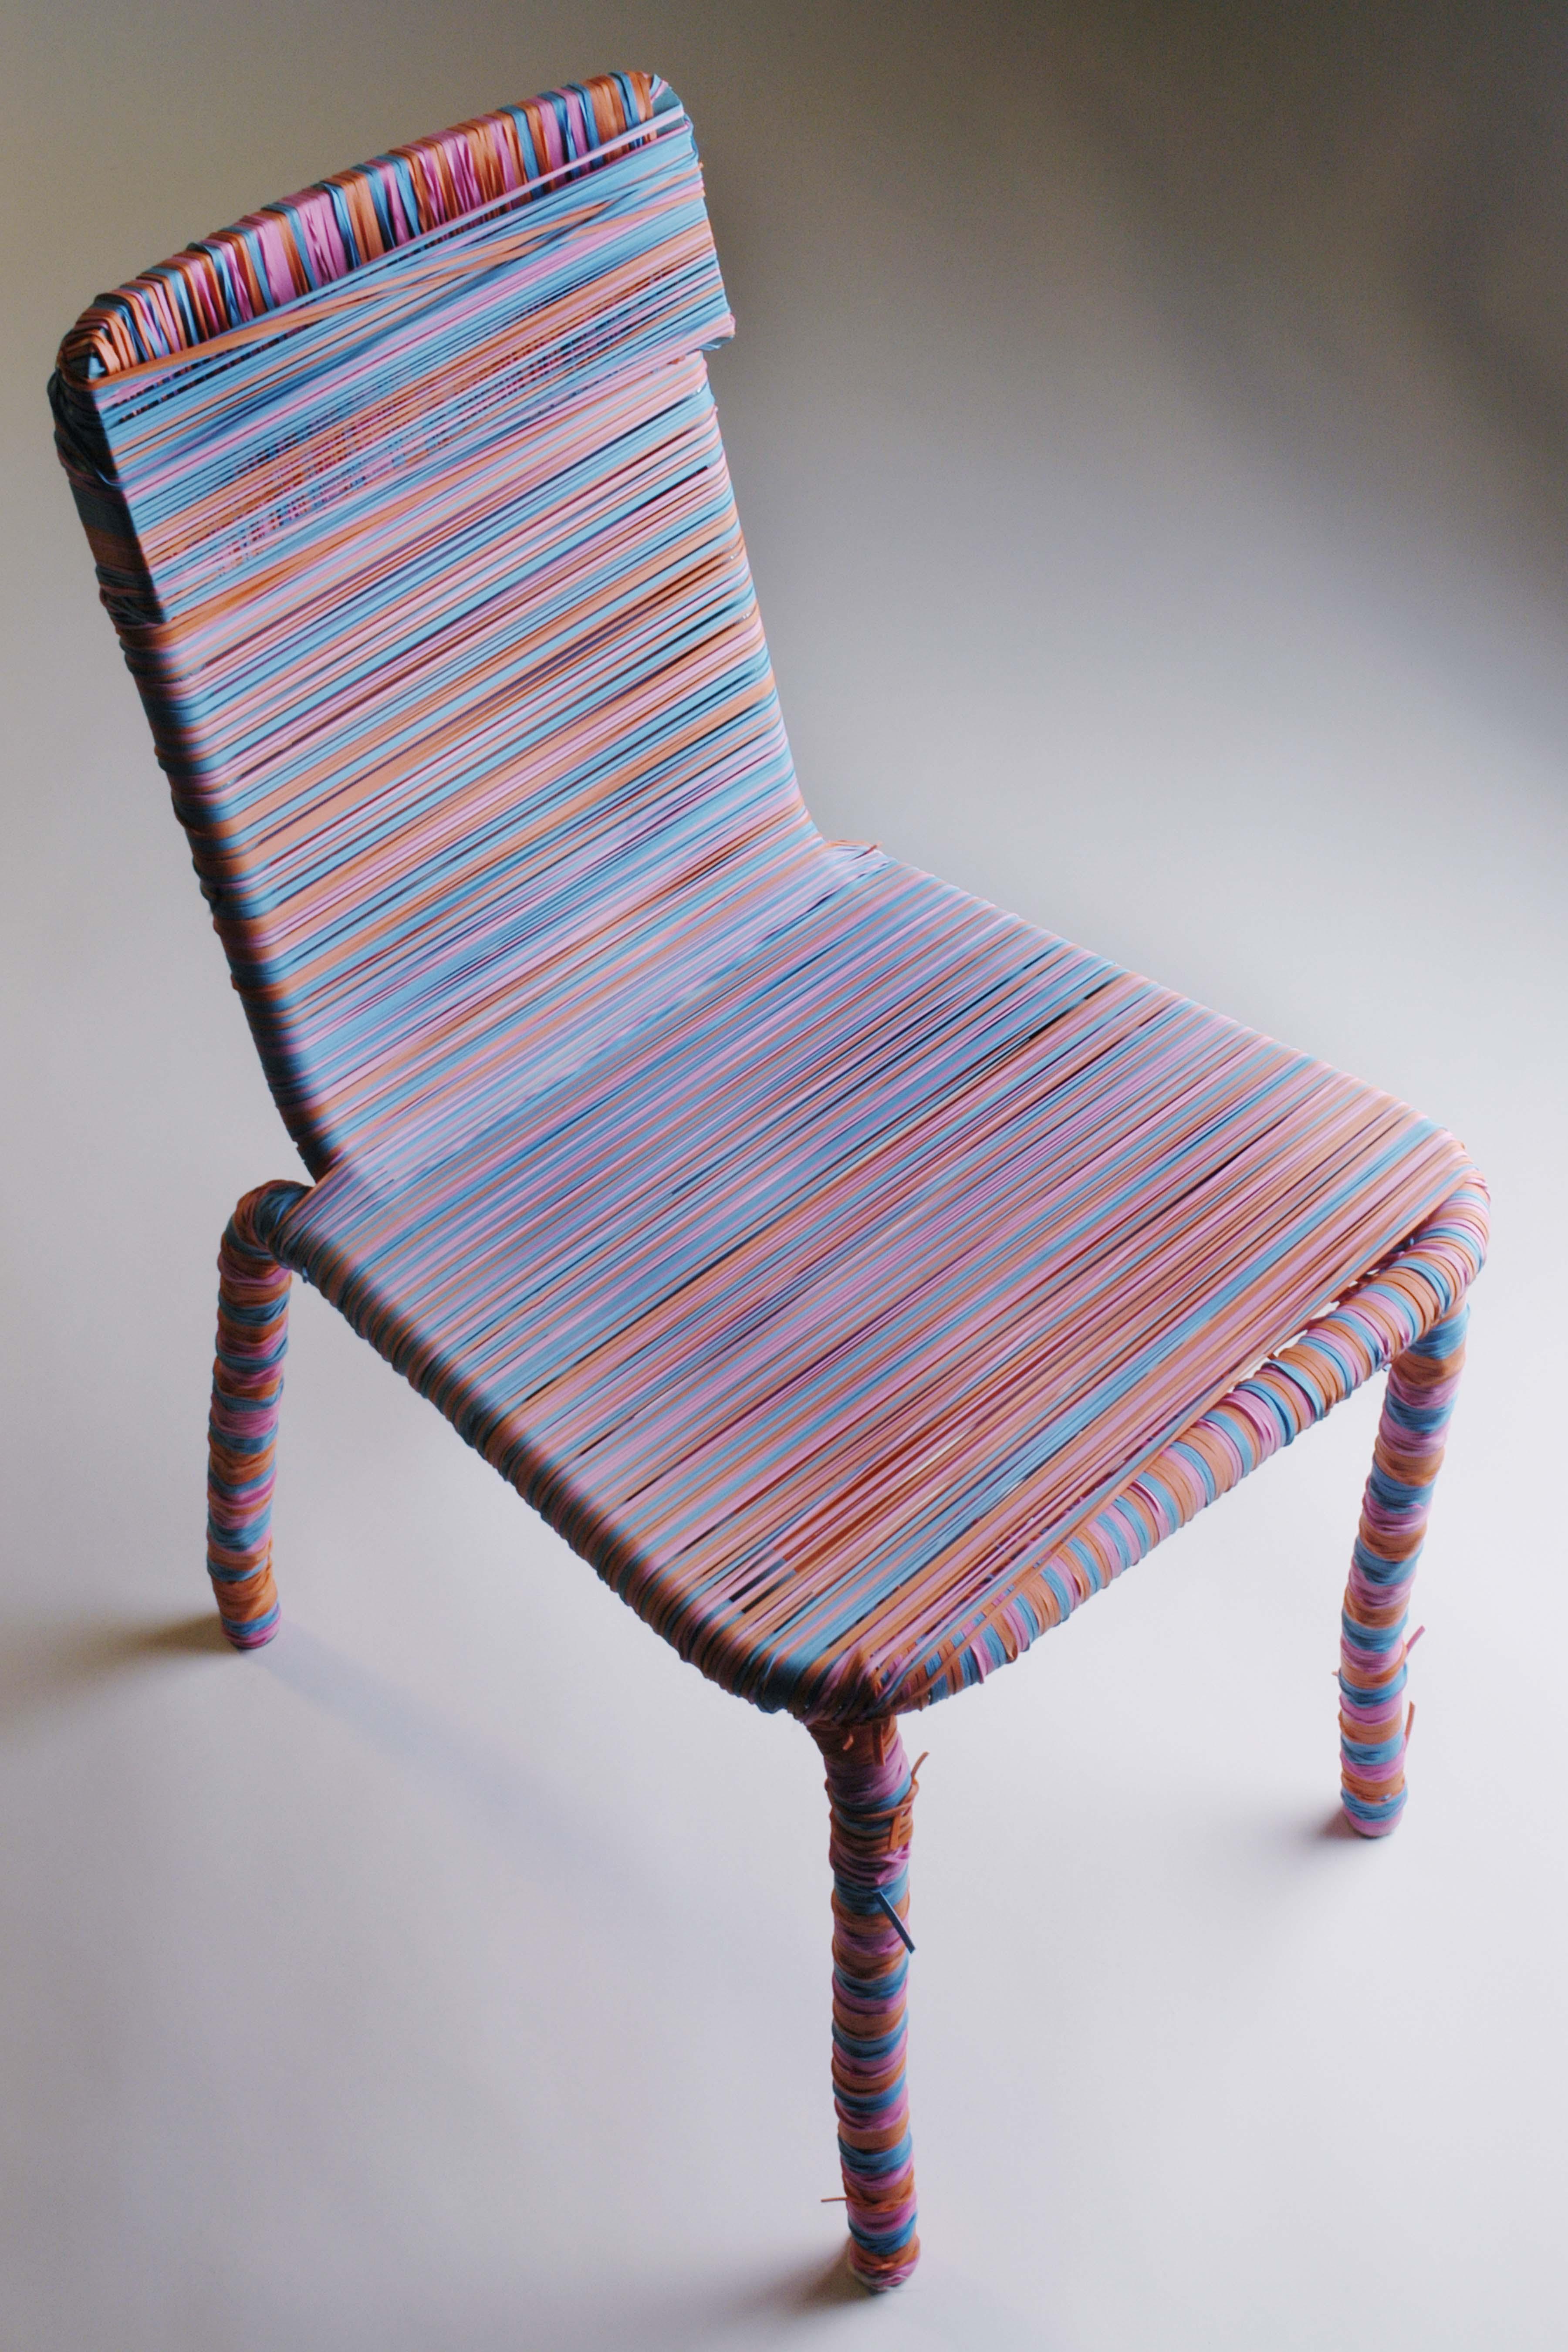 Harrington Experimental Design Project Rubberband Chair